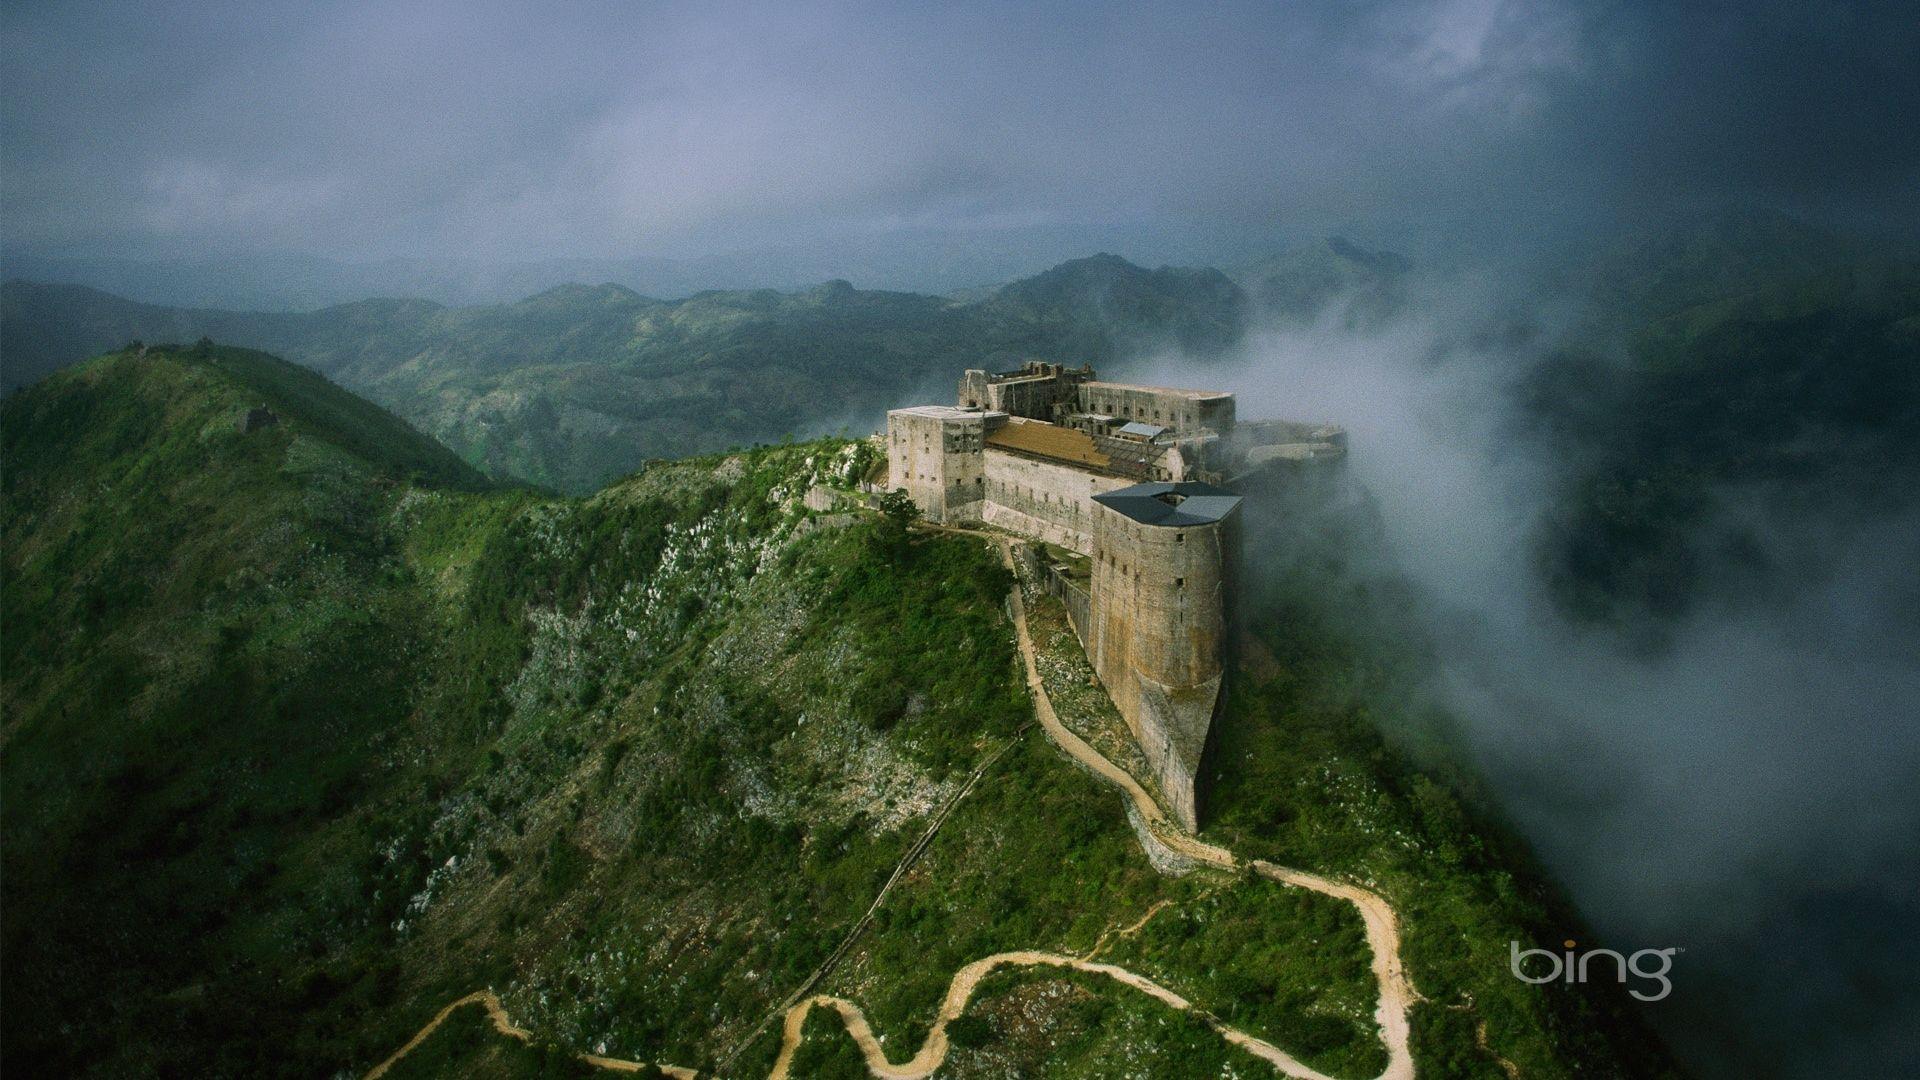 That S My Desktop Haiti Wonders Of The World Aerial View